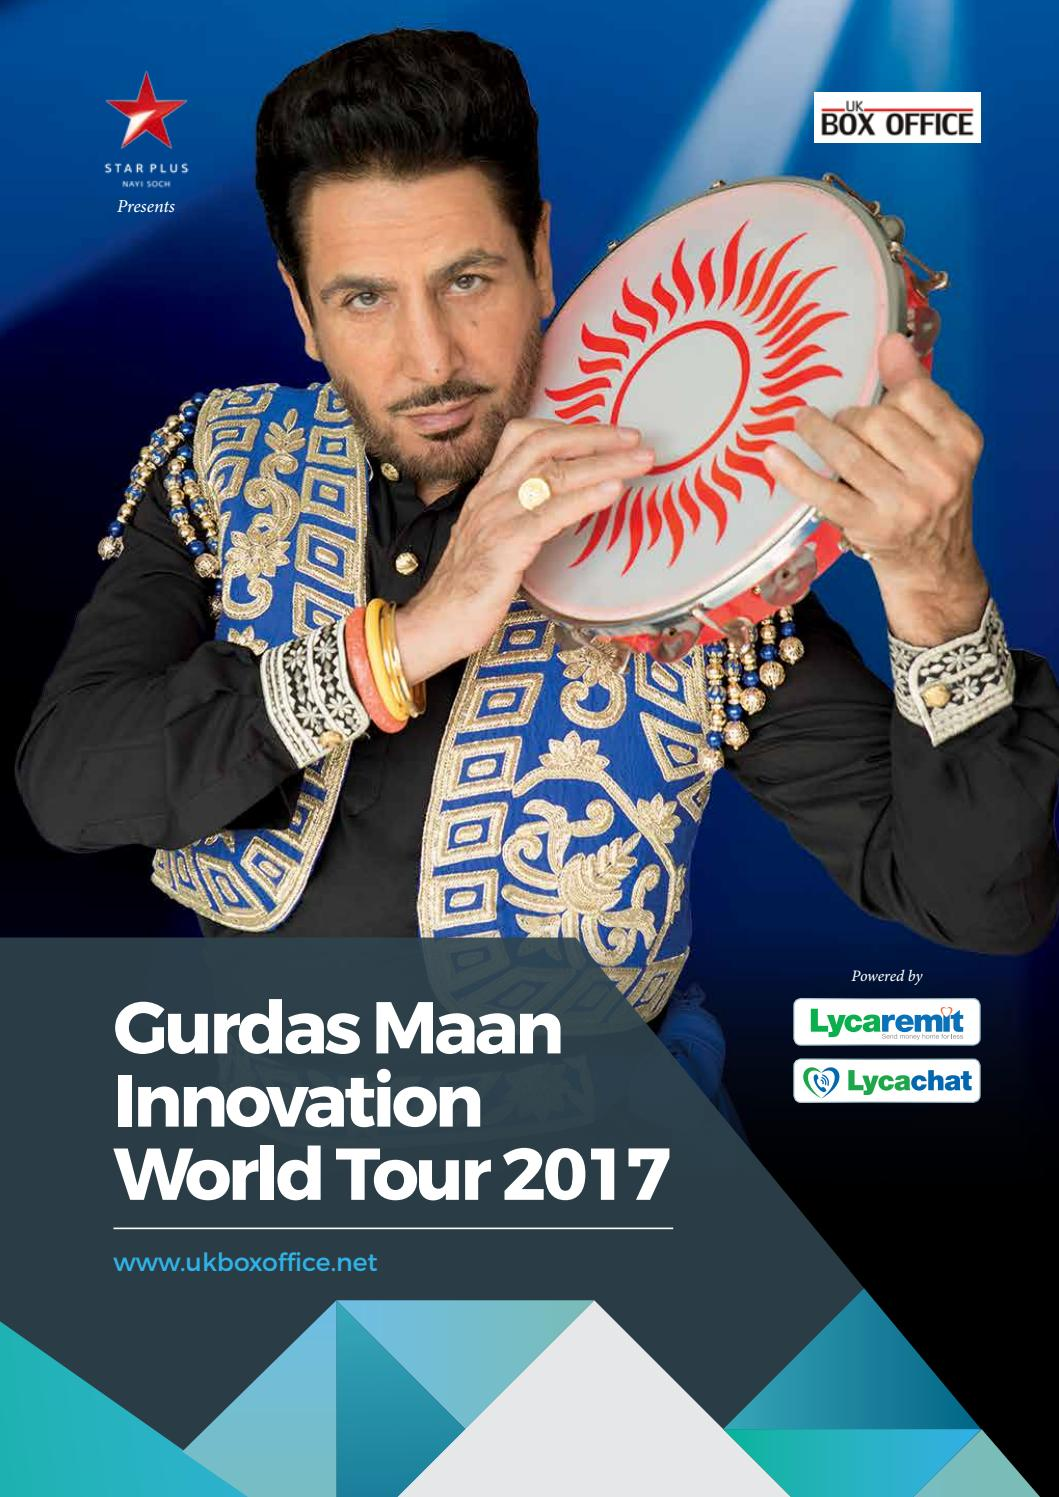 Gurdas Maan Innovation World Tour 2017 by UK Box Office - issuu